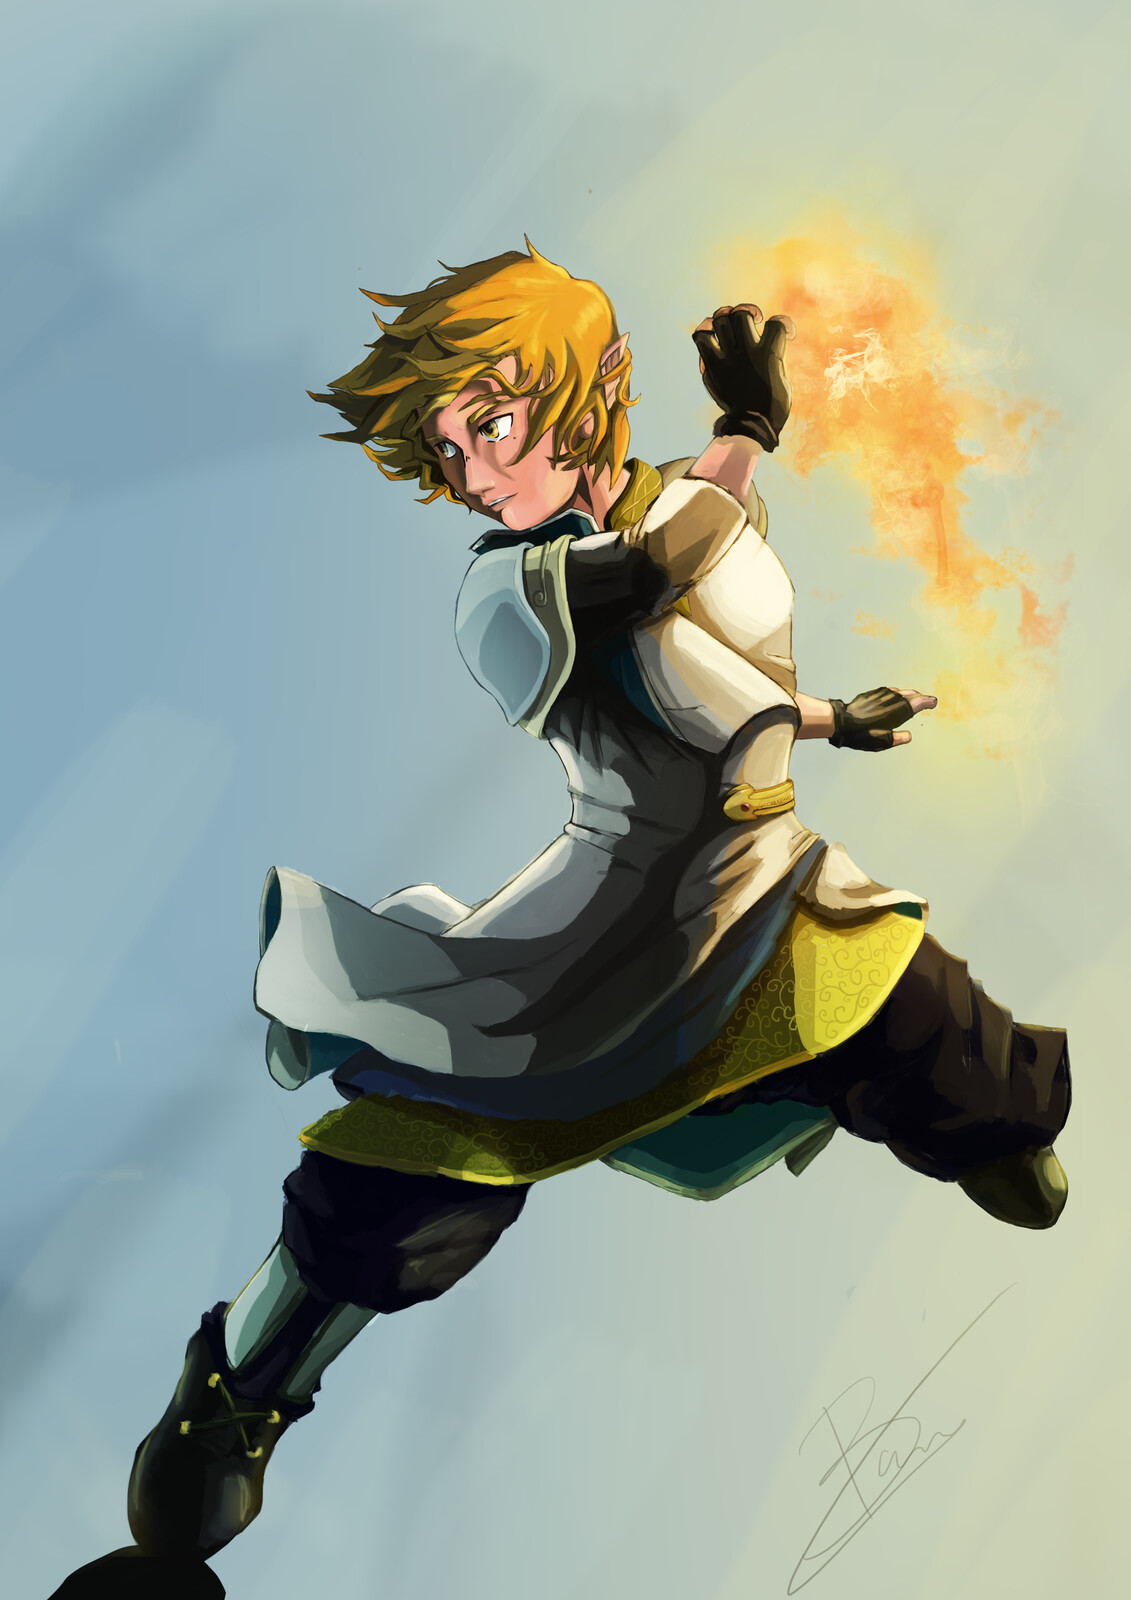 OC - Yallar Character Design: Fire Mage